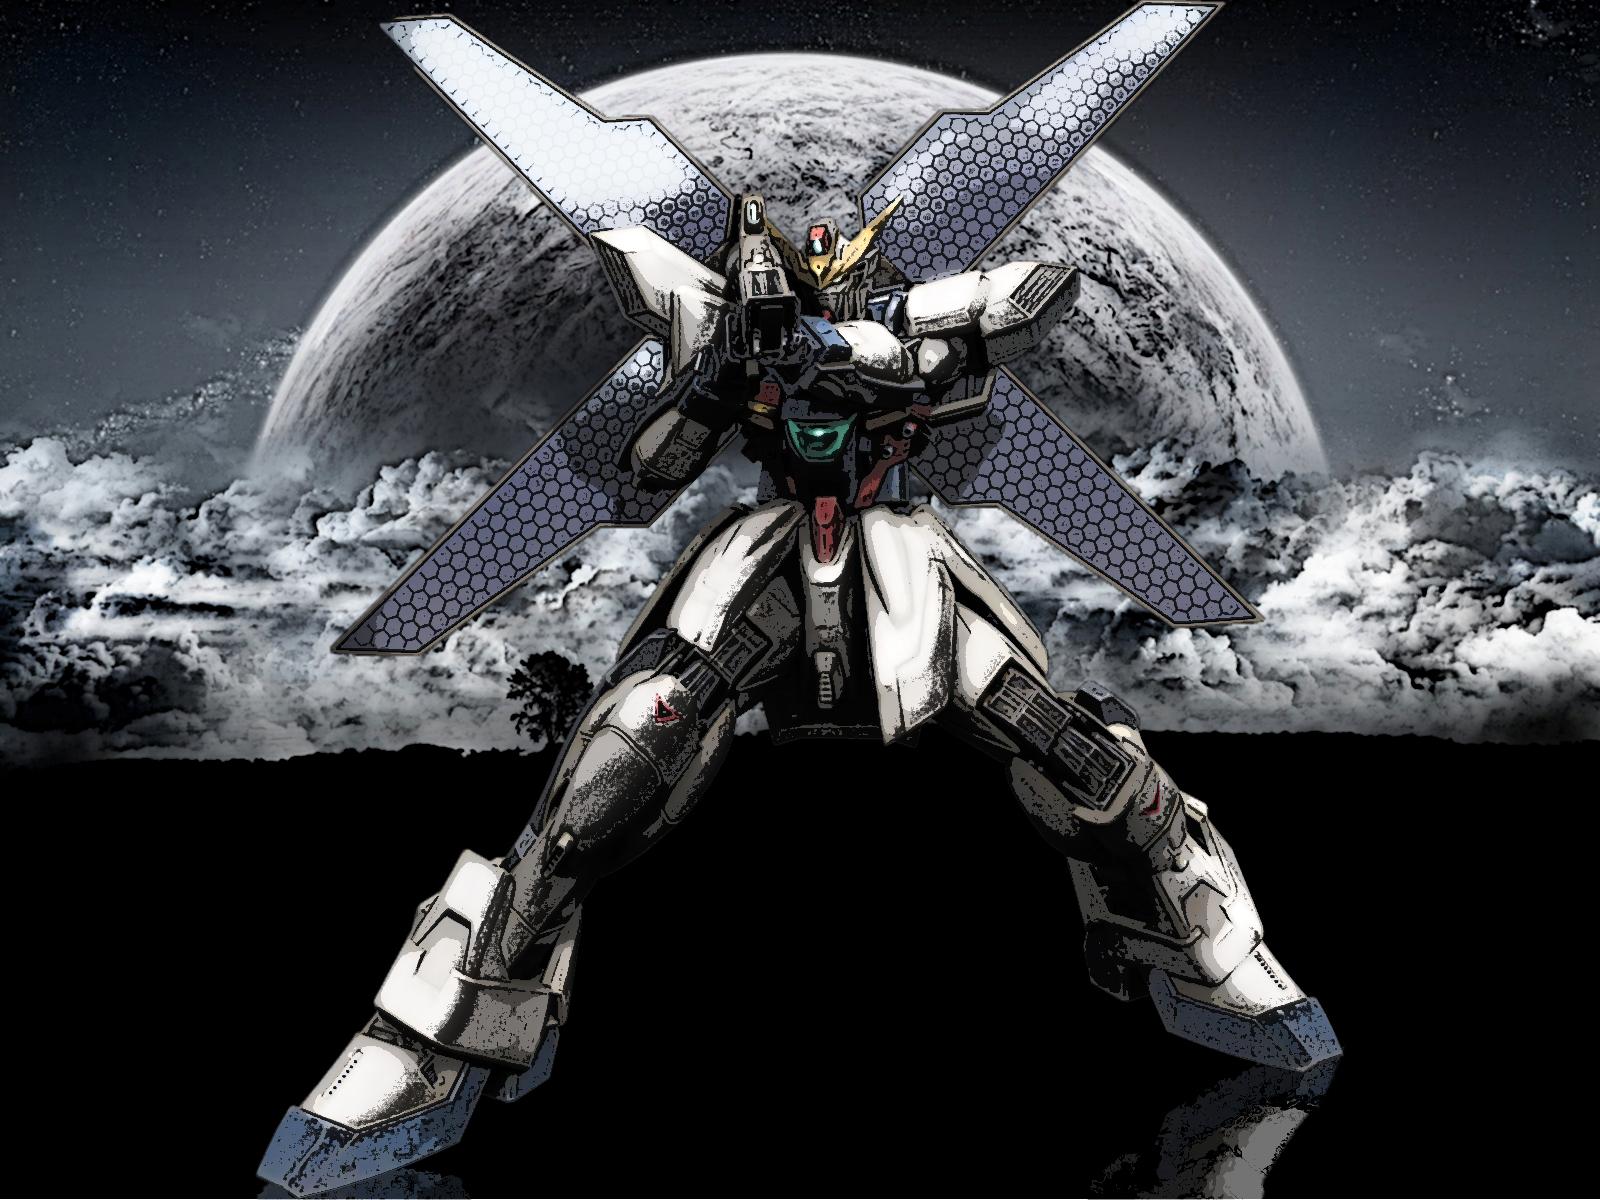 Gundam Wallpaper For Iphone 10221 Wallpaper Game Wallpapers HD 1600x1200